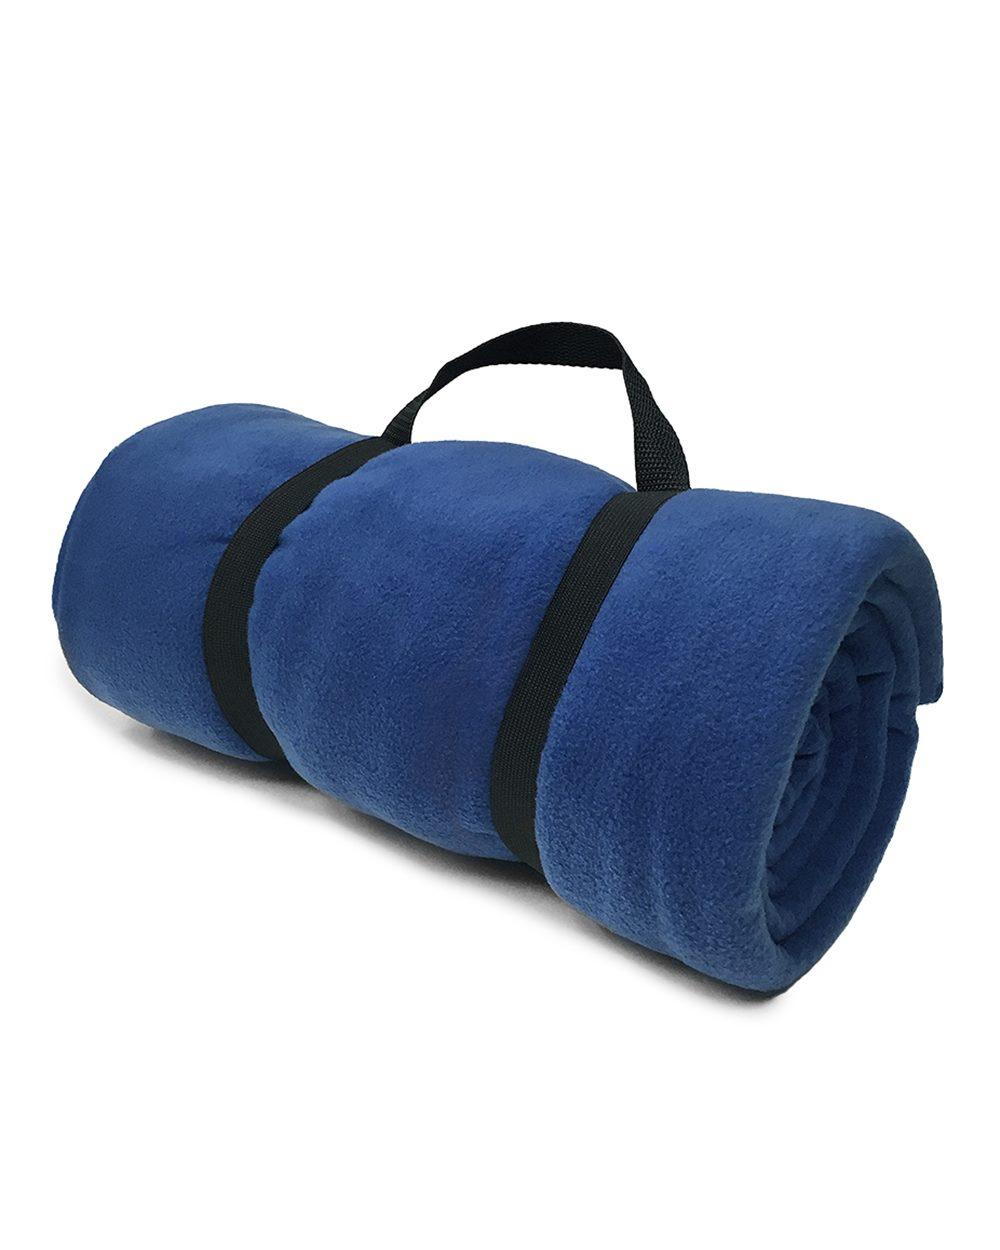 Colorado Clothing STRAP Sport Blanket Strap